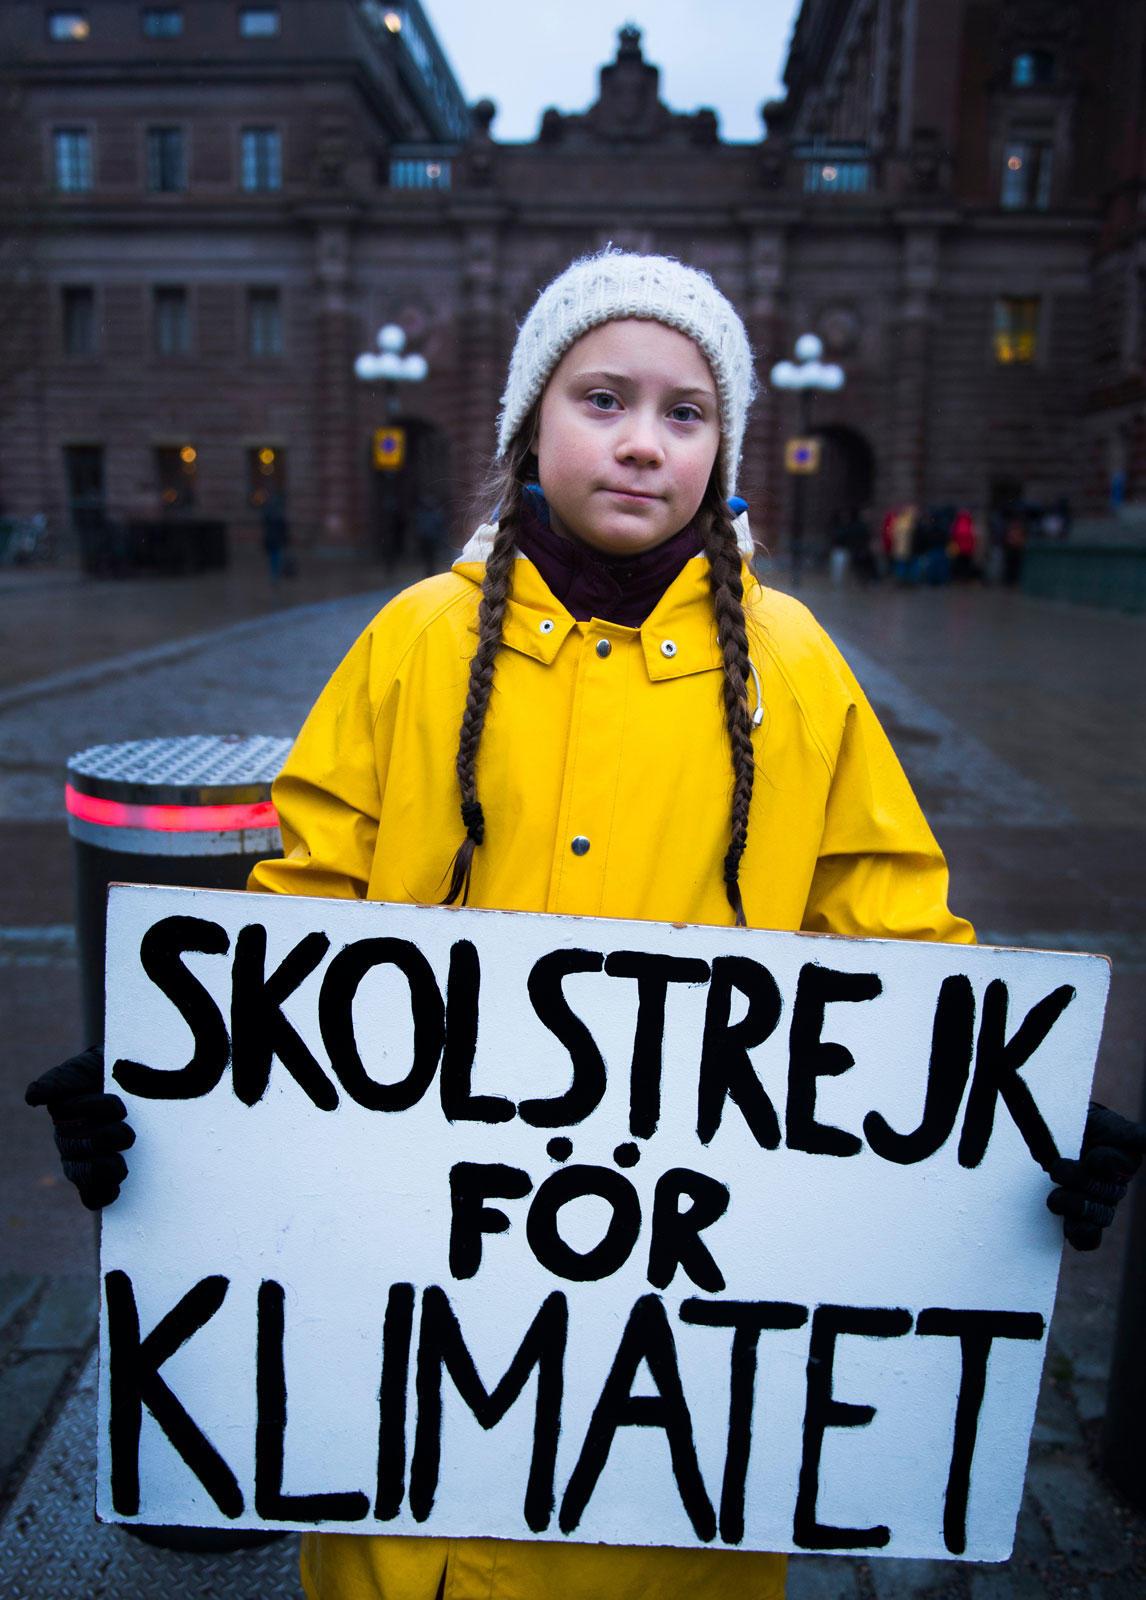 Greta-Thunberg-School-Strike-for-Change-Swedish-parliament-November-2018.